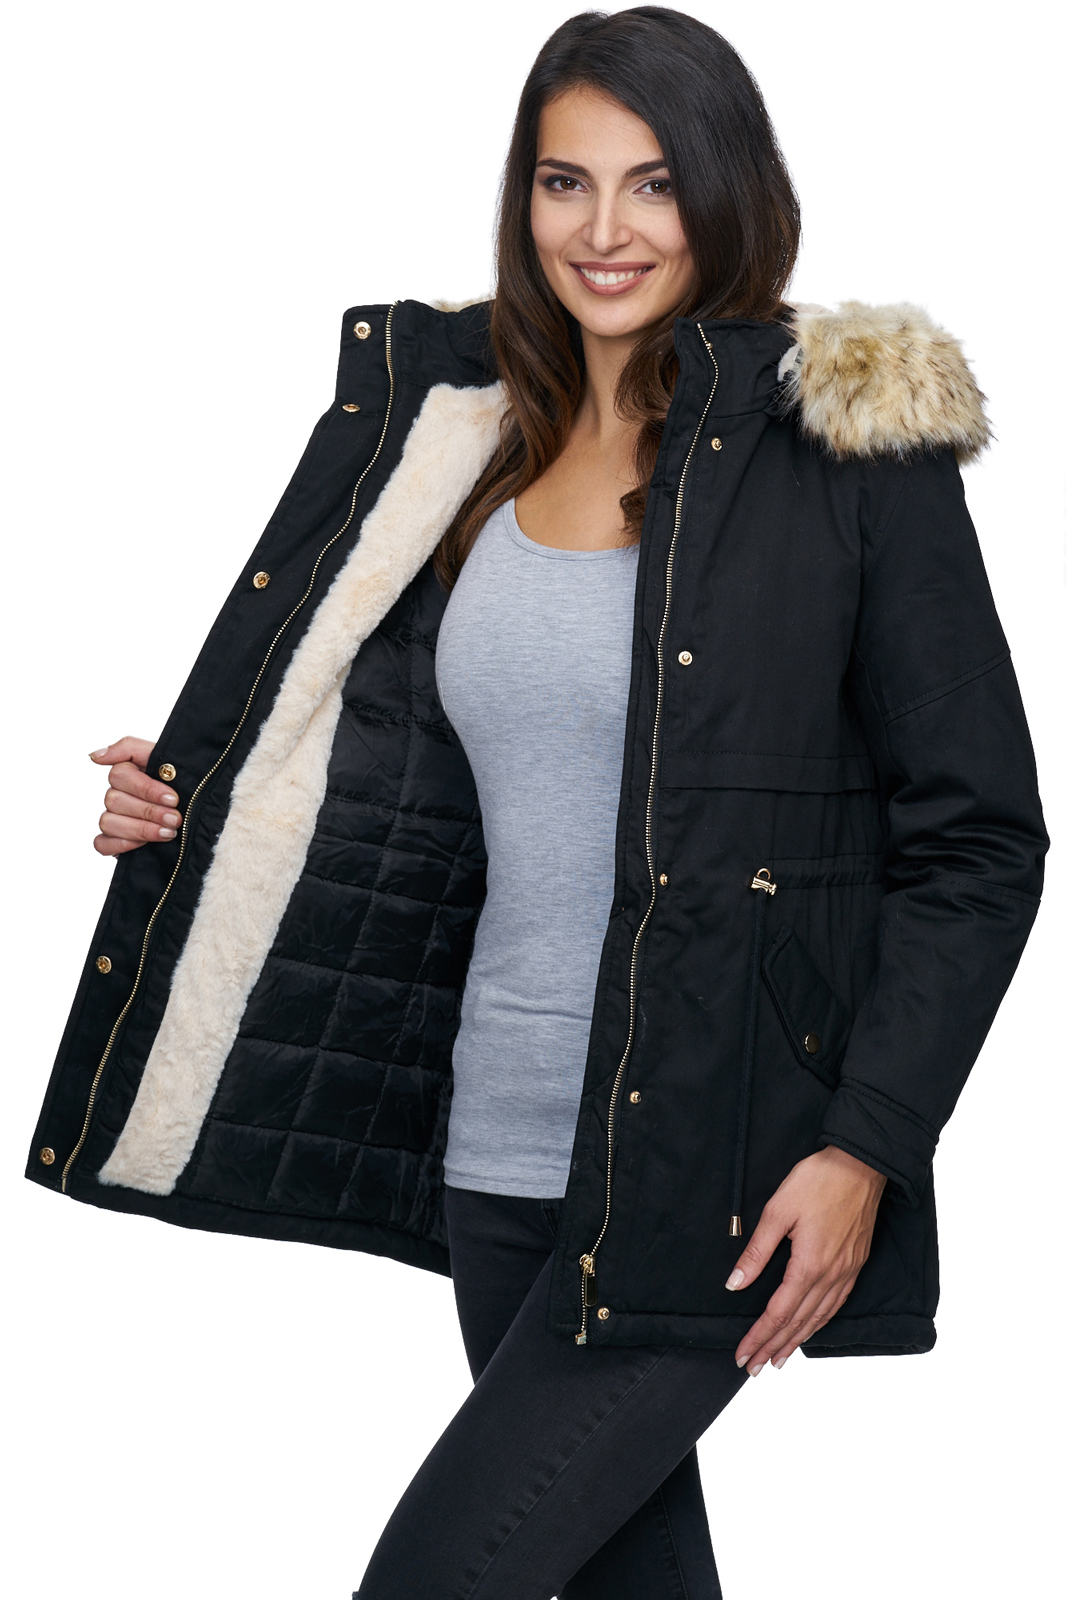 designer damen winterjacke parka warm mantel winter jacke. Black Bedroom Furniture Sets. Home Design Ideas